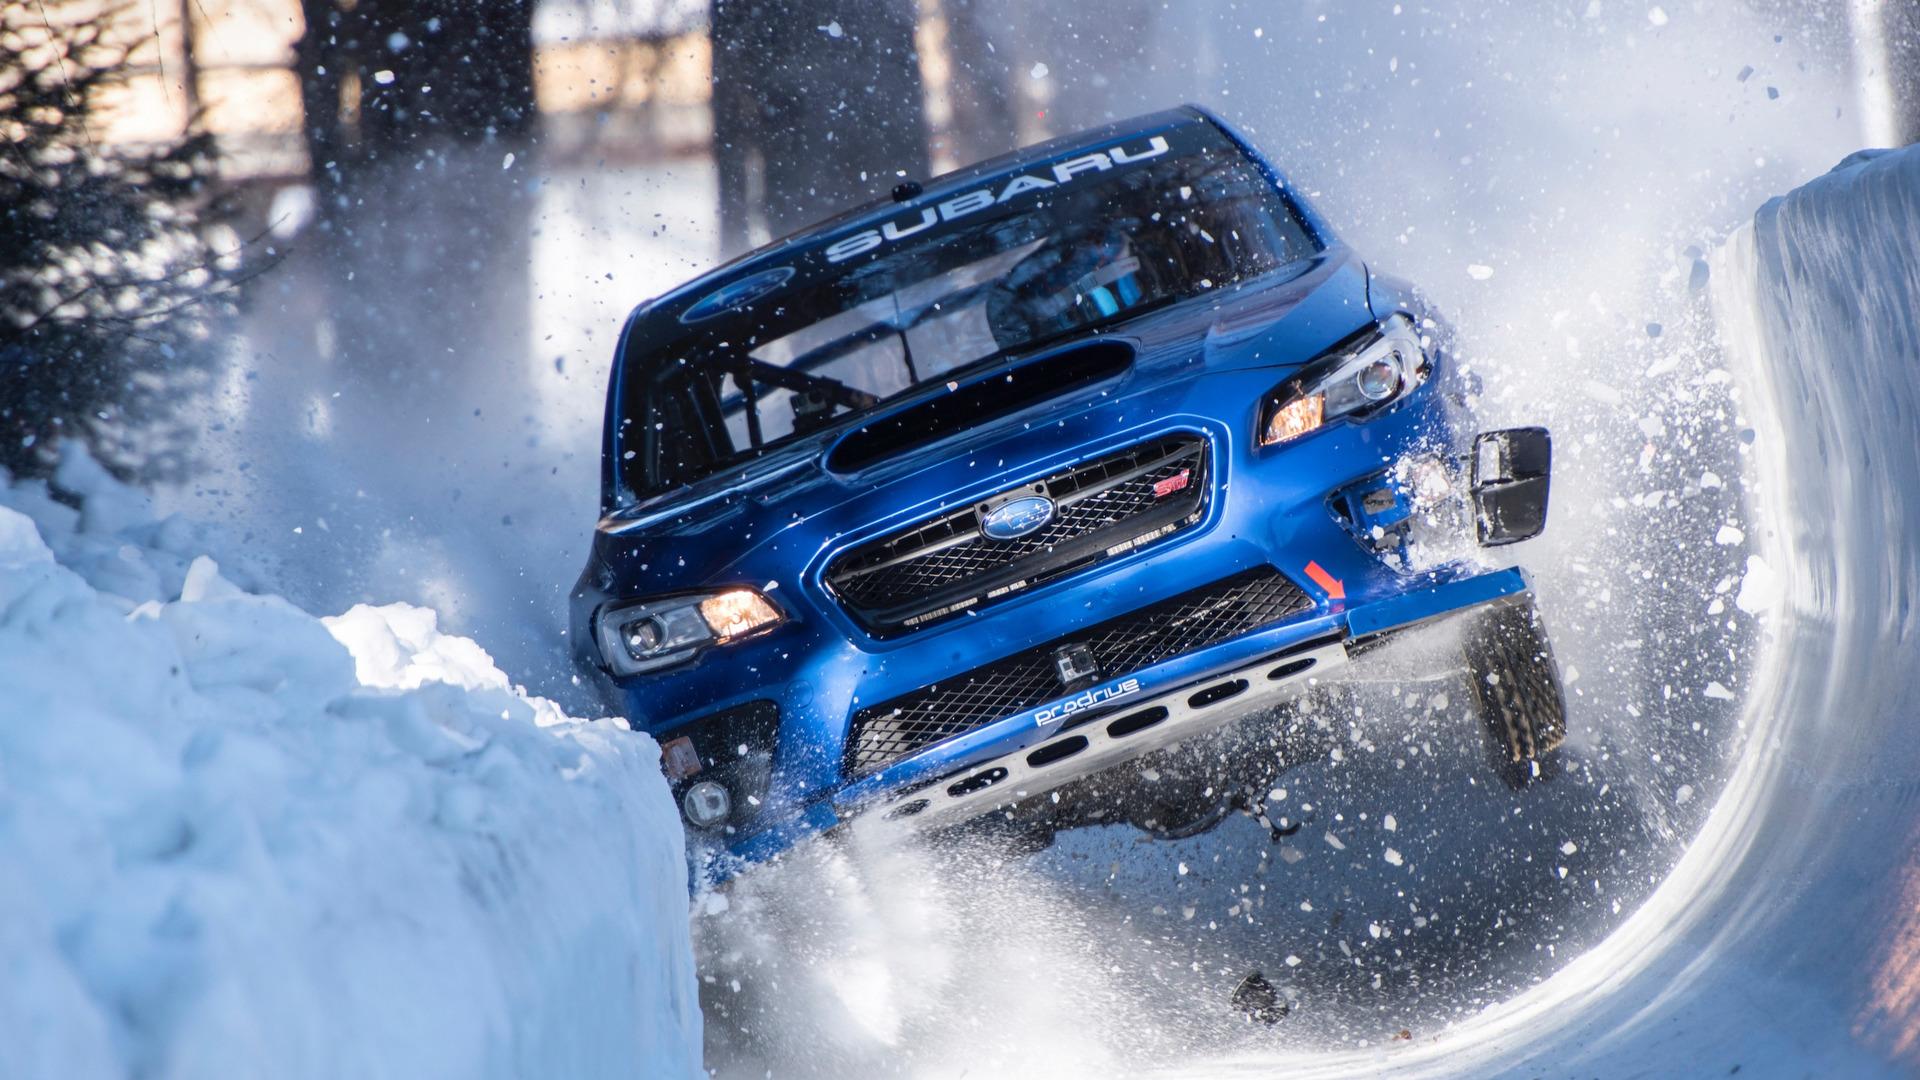 Photo of Μια τρελή κατάβαση με ένα Subaru Impreza [vid]